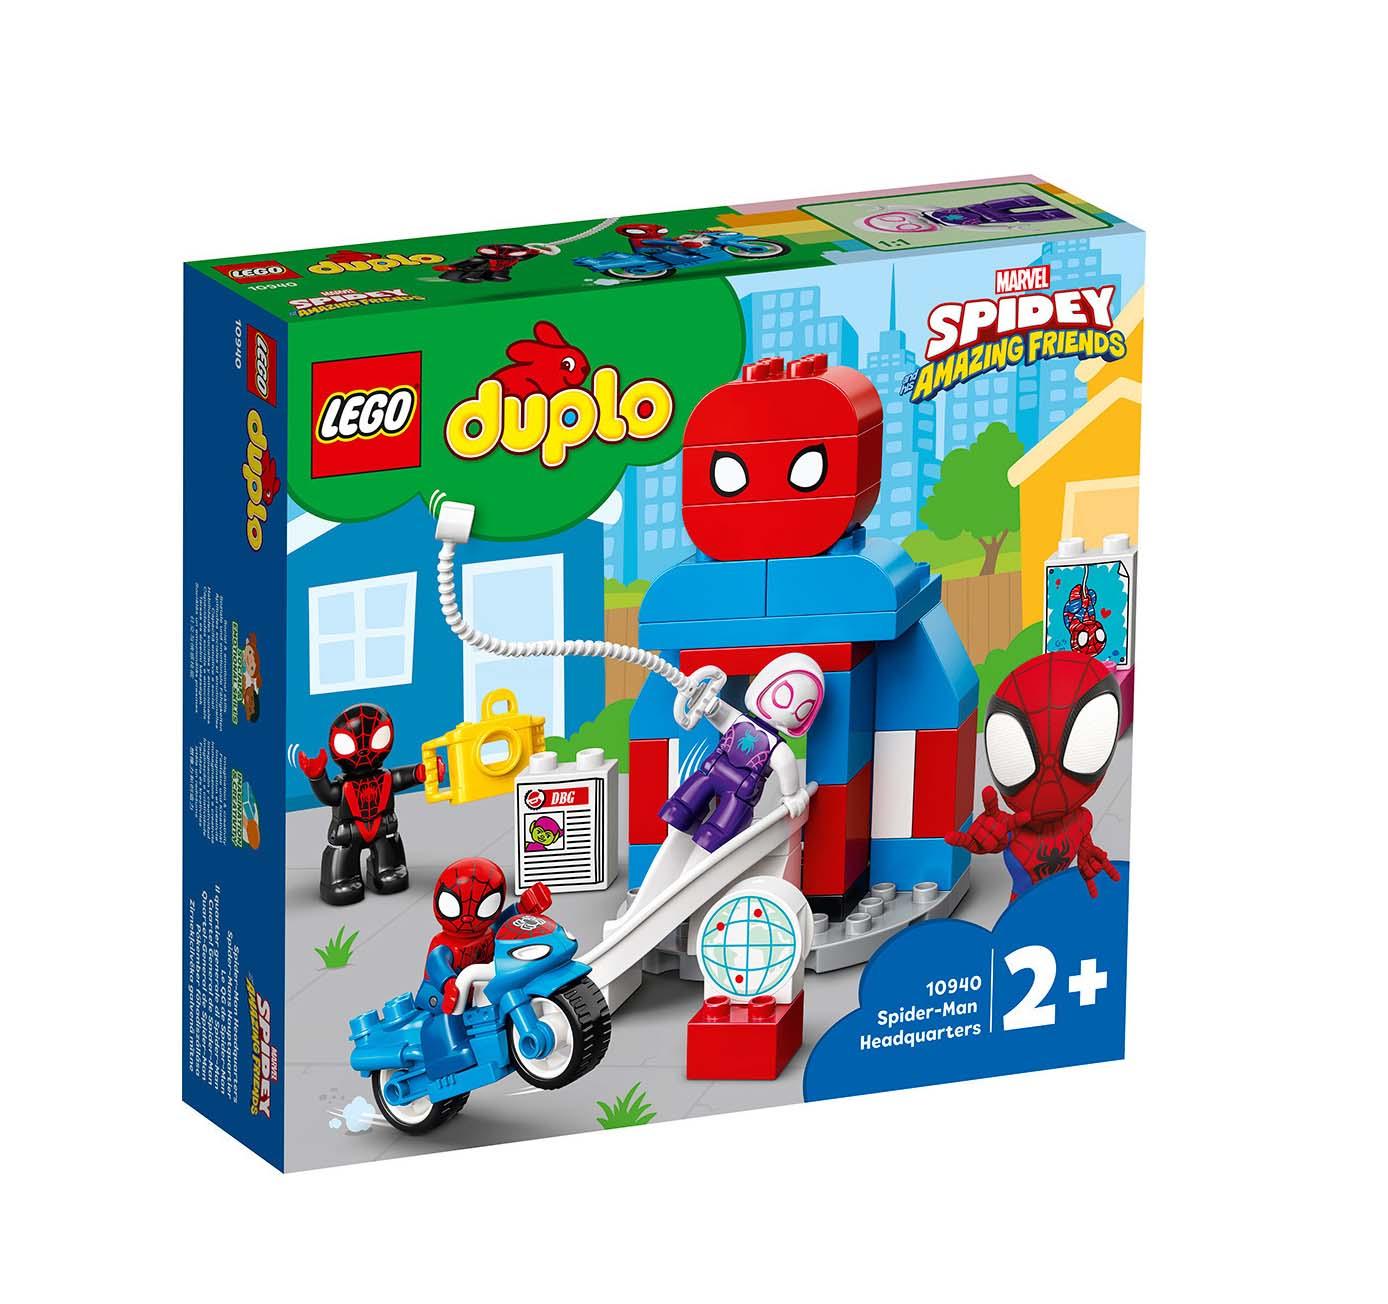 Lego Duplo: Spider-Man Headquarters 10940